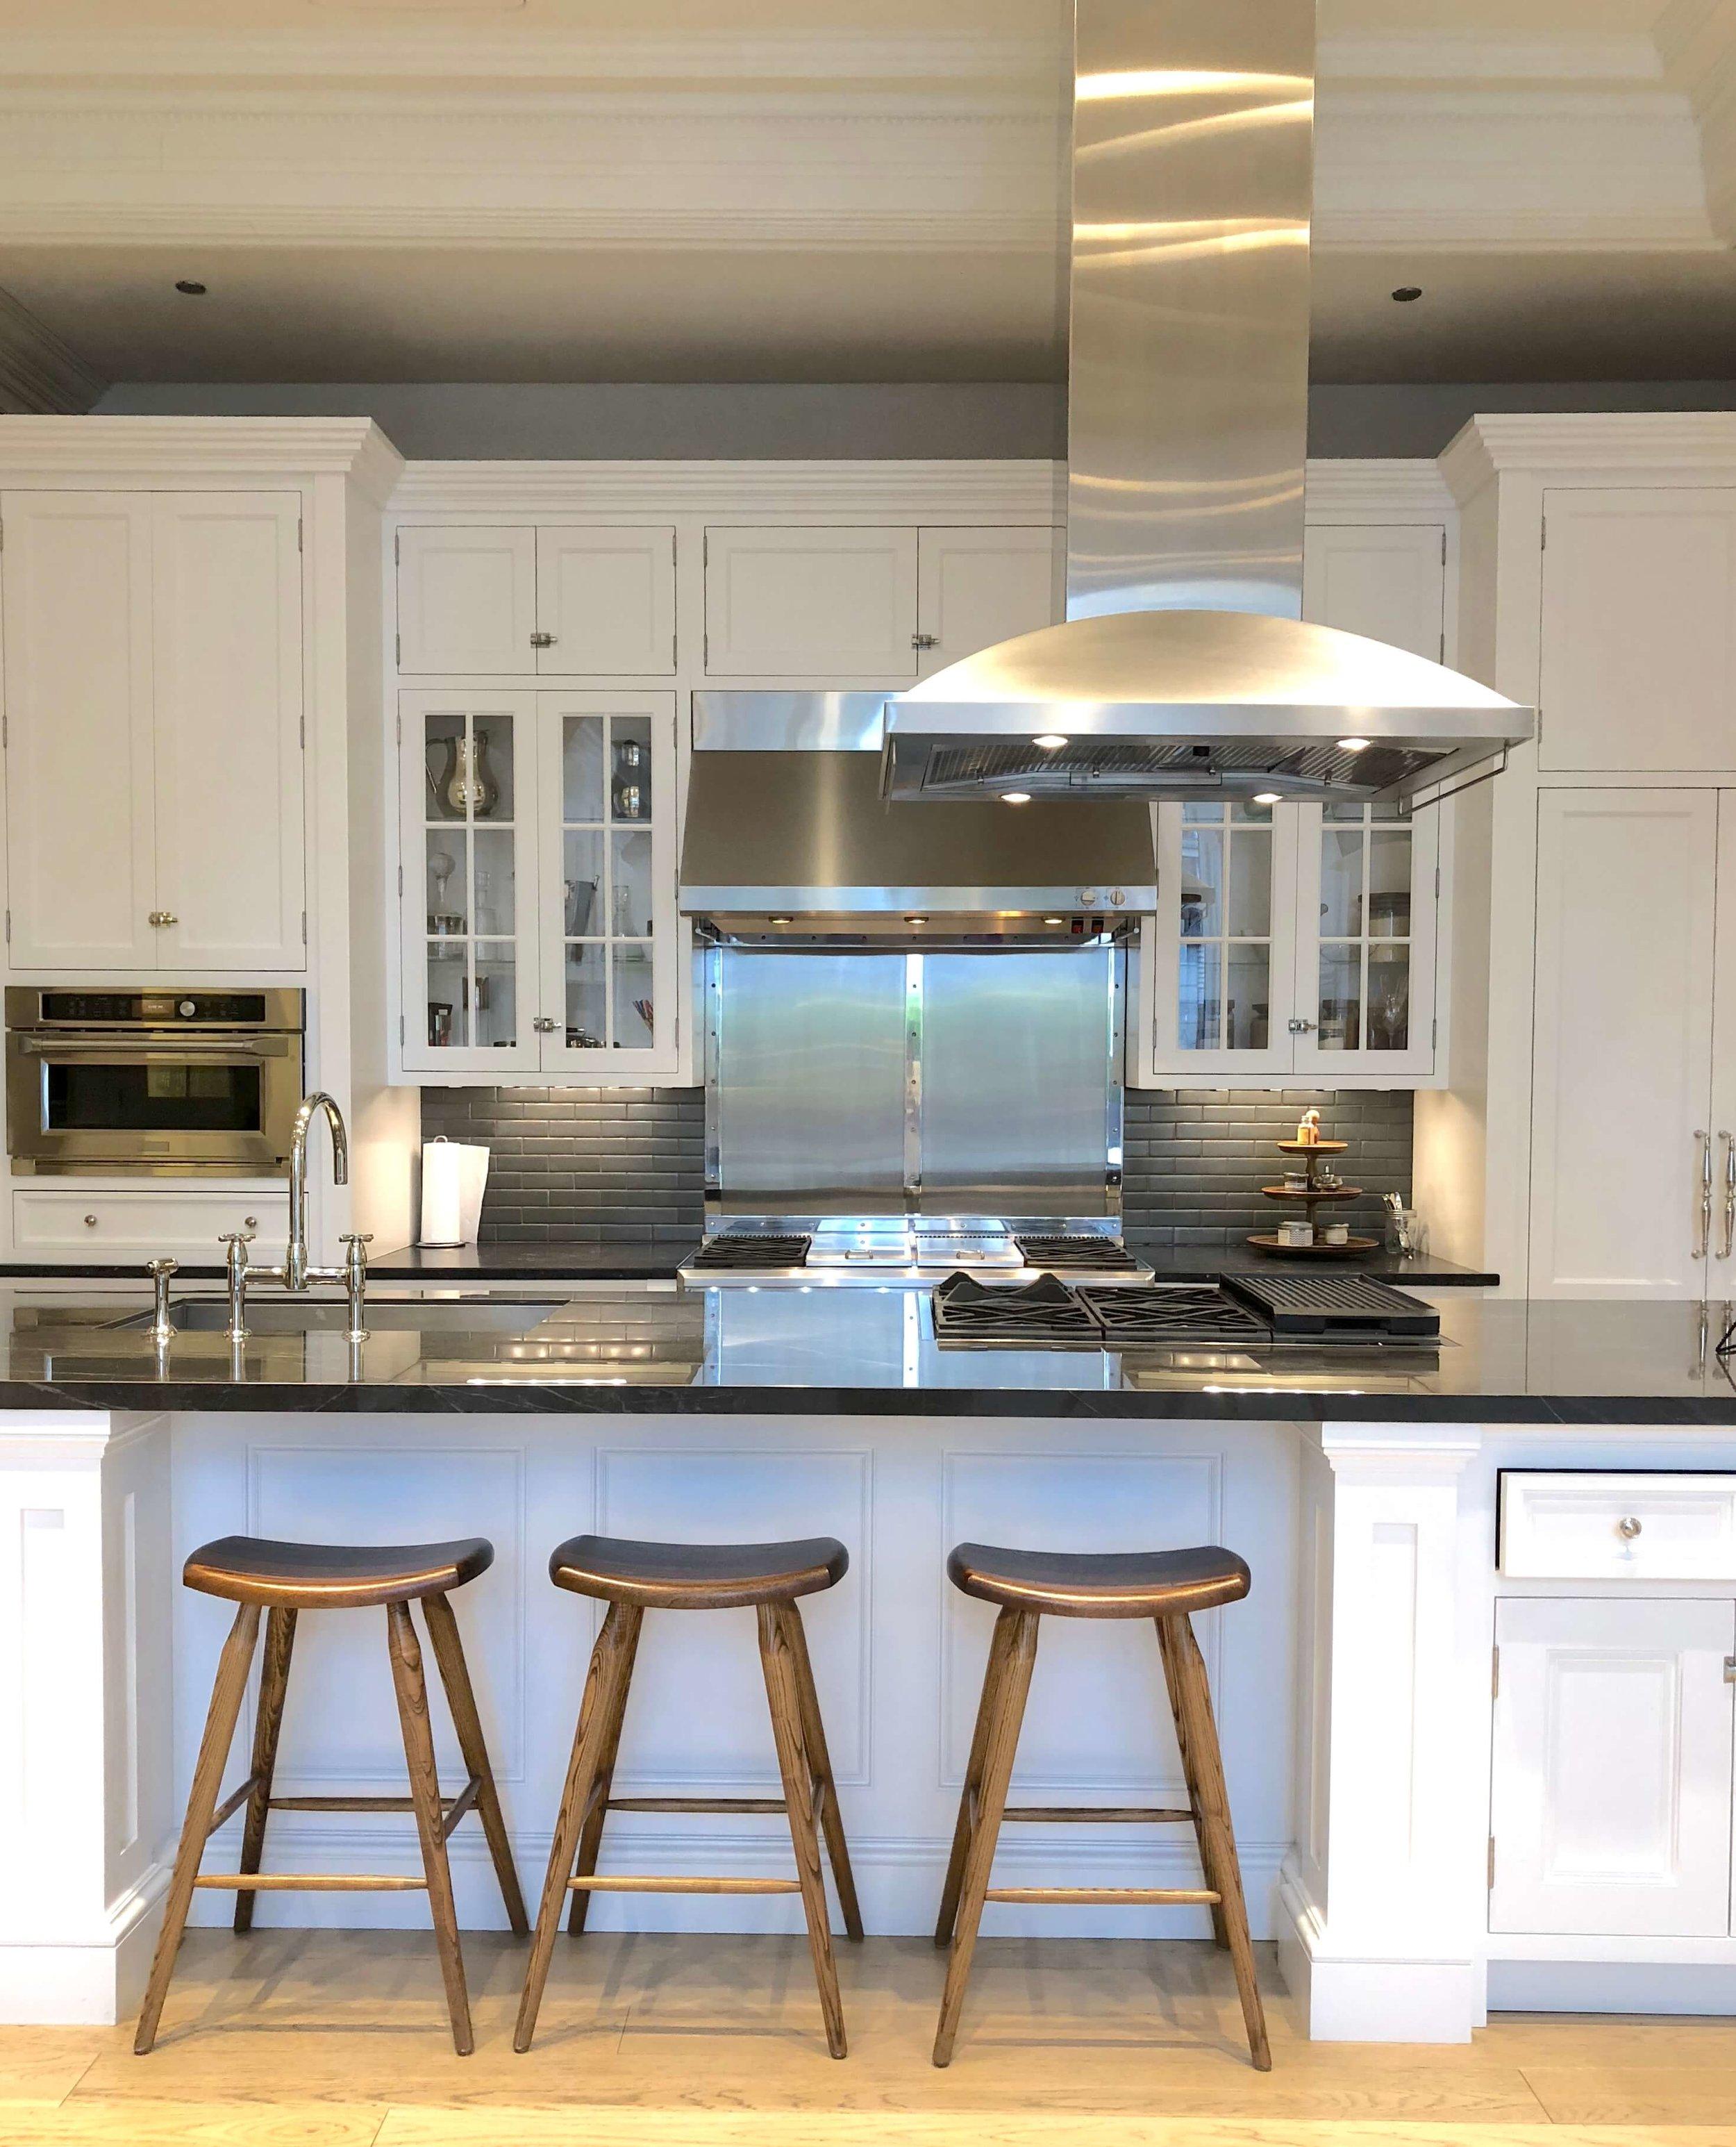 One of the beautiful kitchens in the Monogram Design Center in Chicago #monogramappliances #whitekitchen